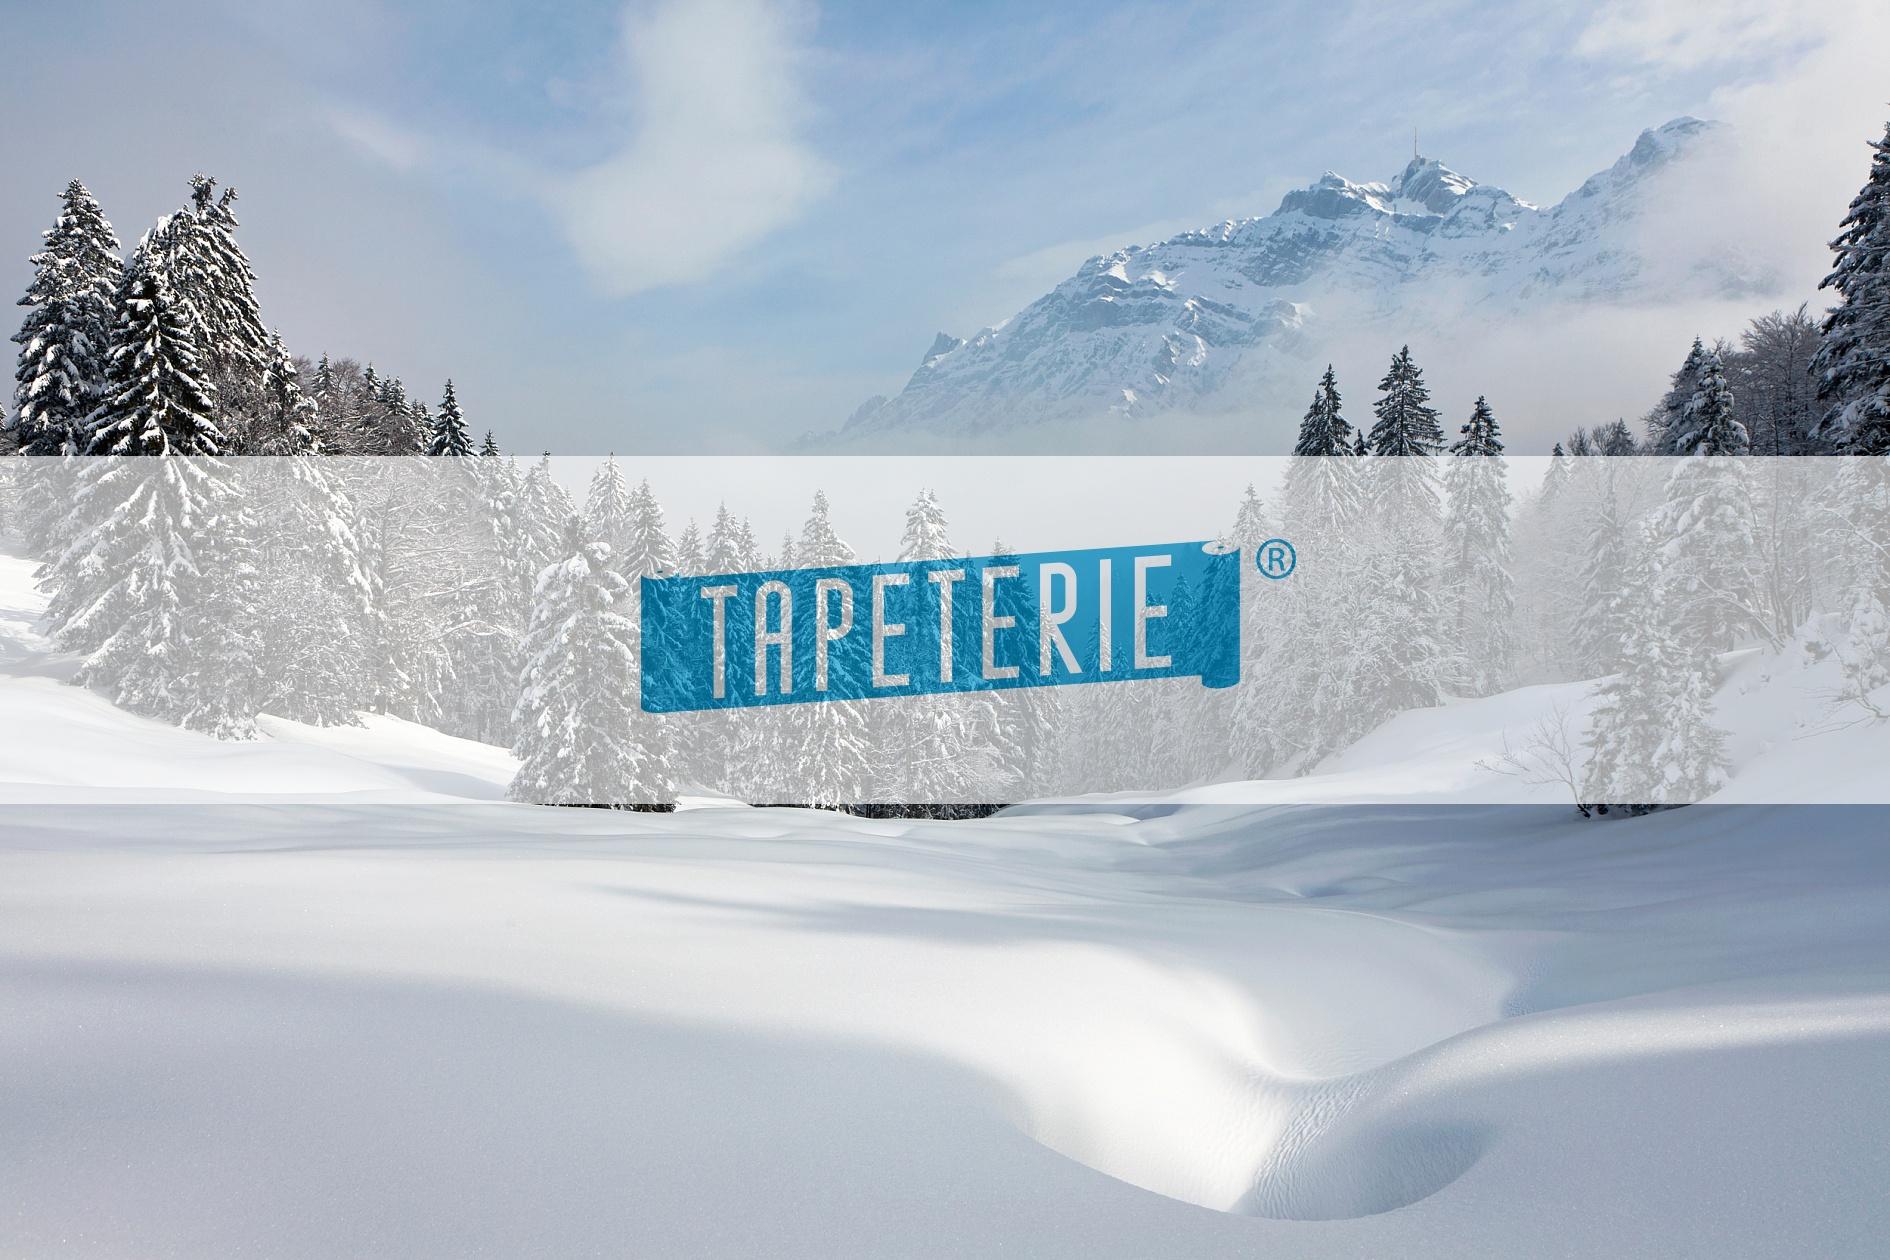 Fototapeten Winterlandschaft : Fototapete unber?hrte Winterlandschaft Tapeterie